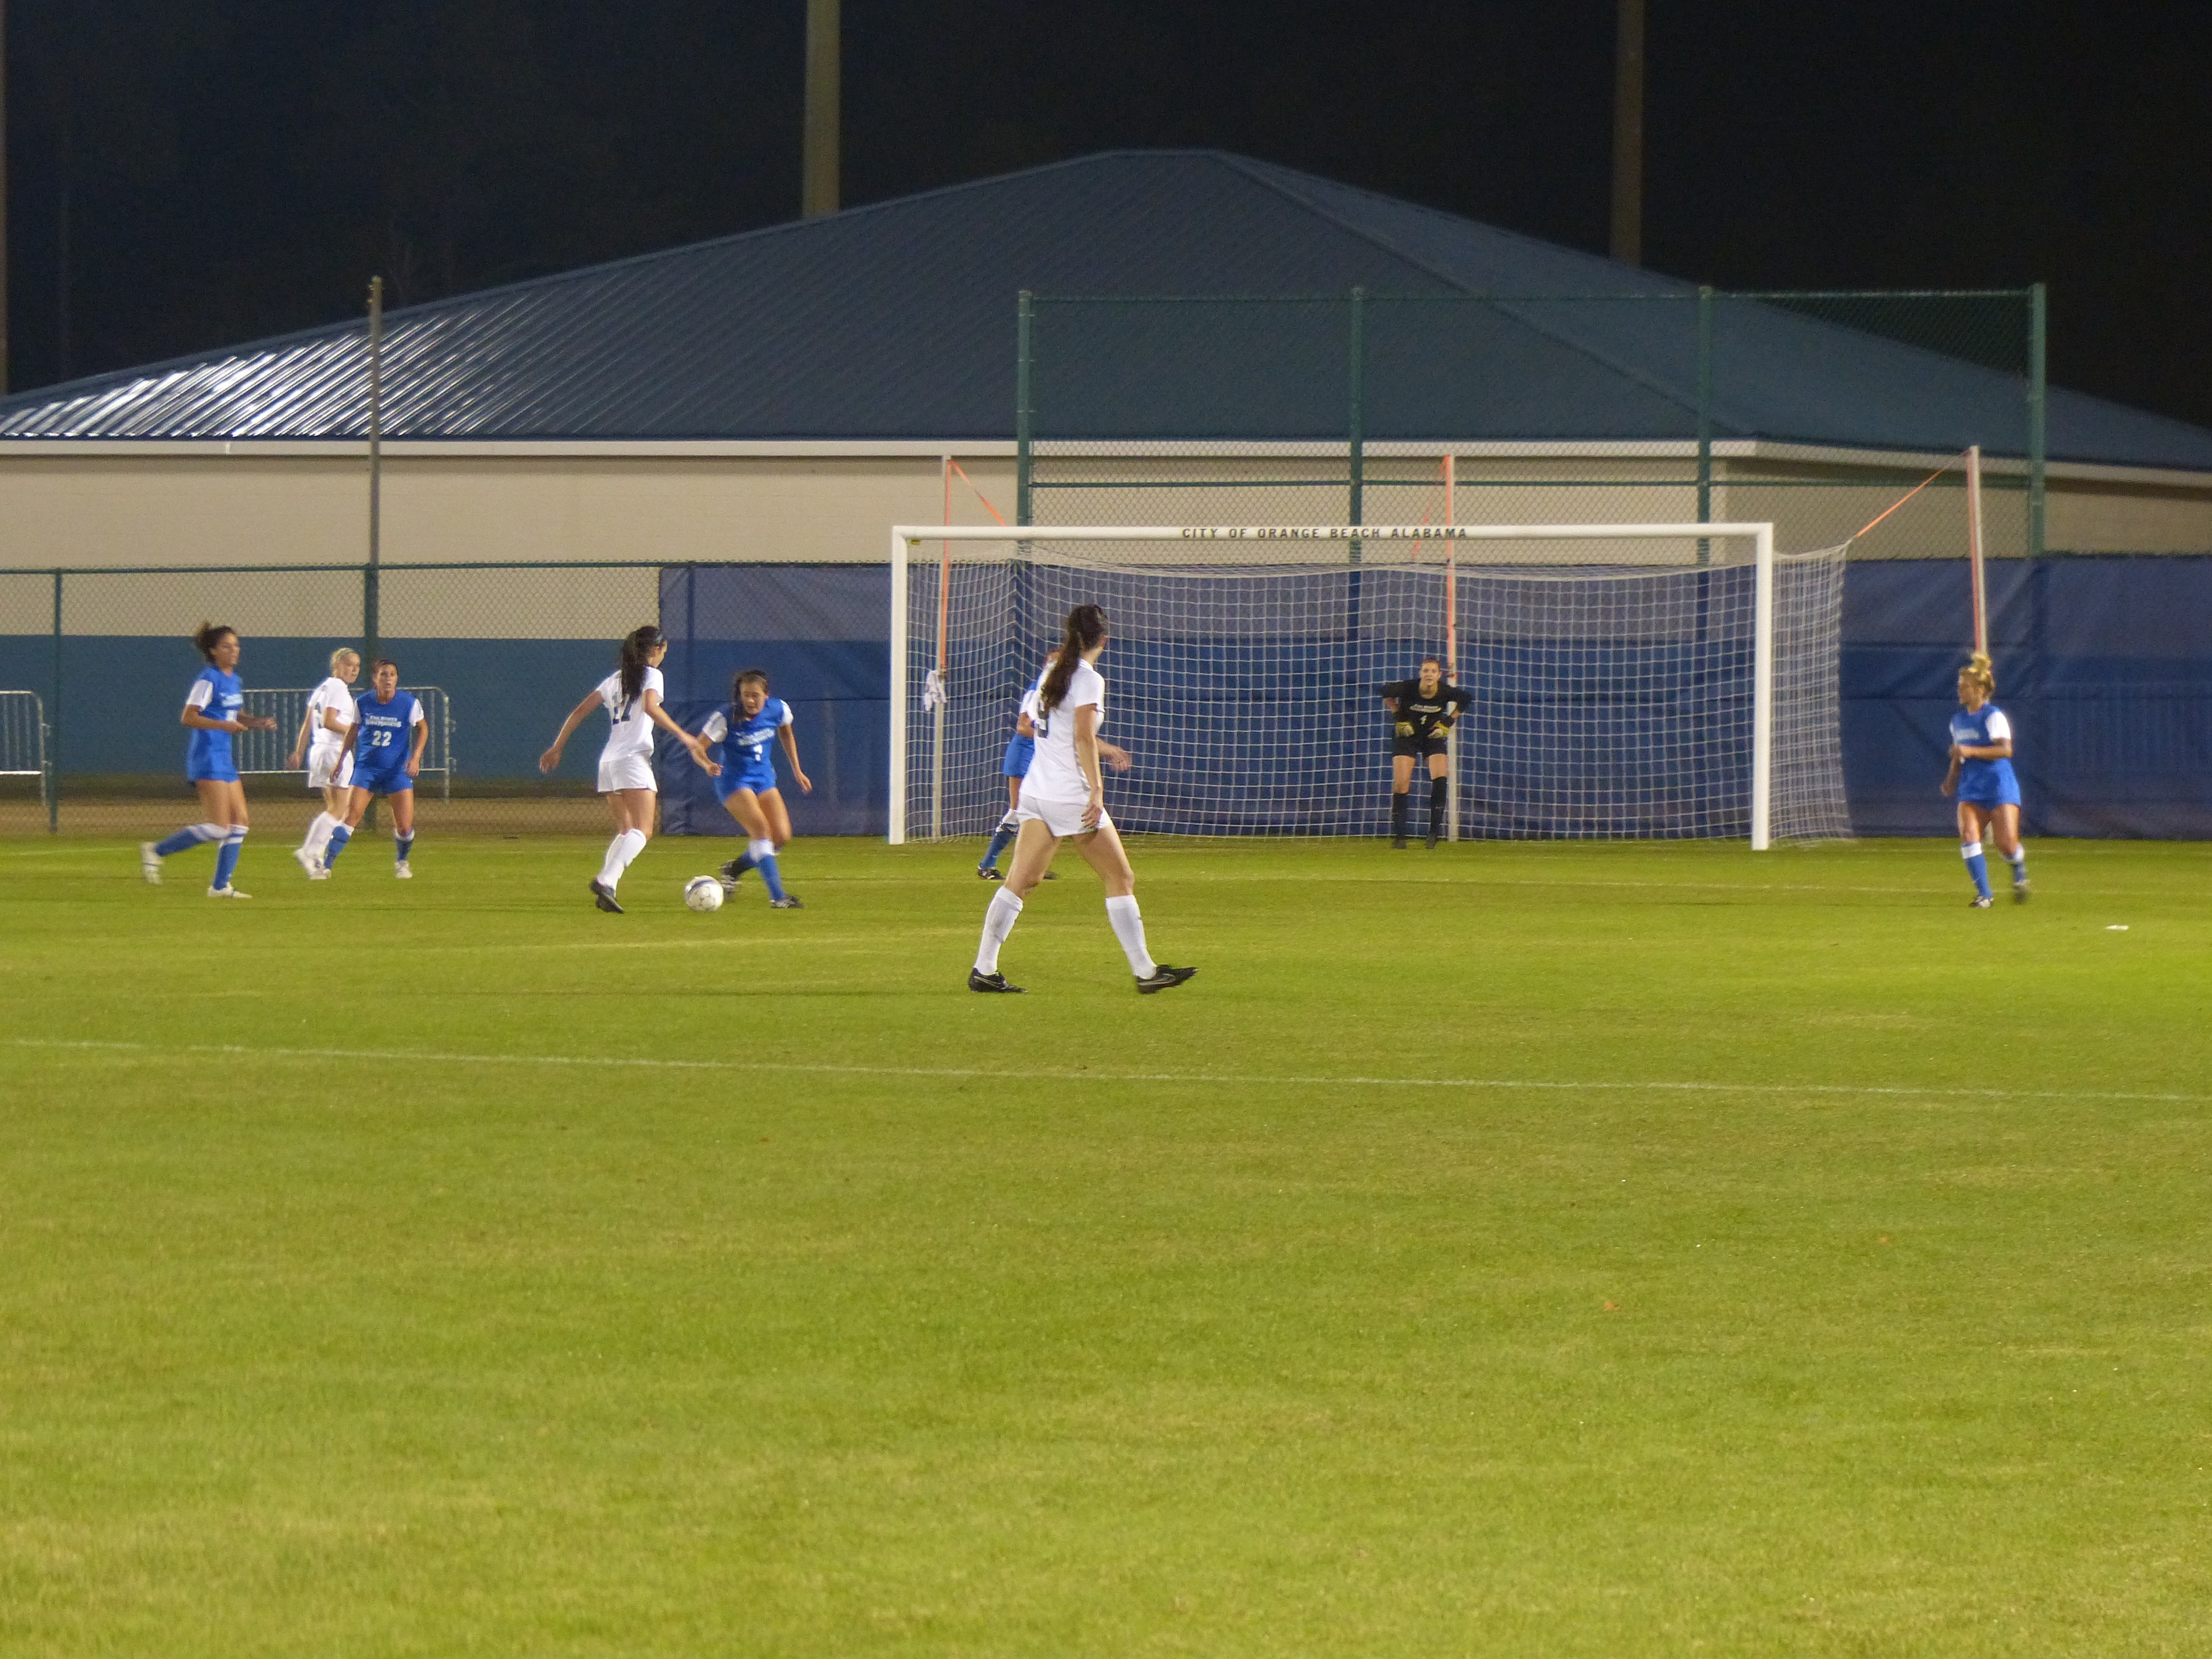 2014-naia-womens-soccer-national-championships-2014-nw-ohio-vs-the-masters-12-01-2014/